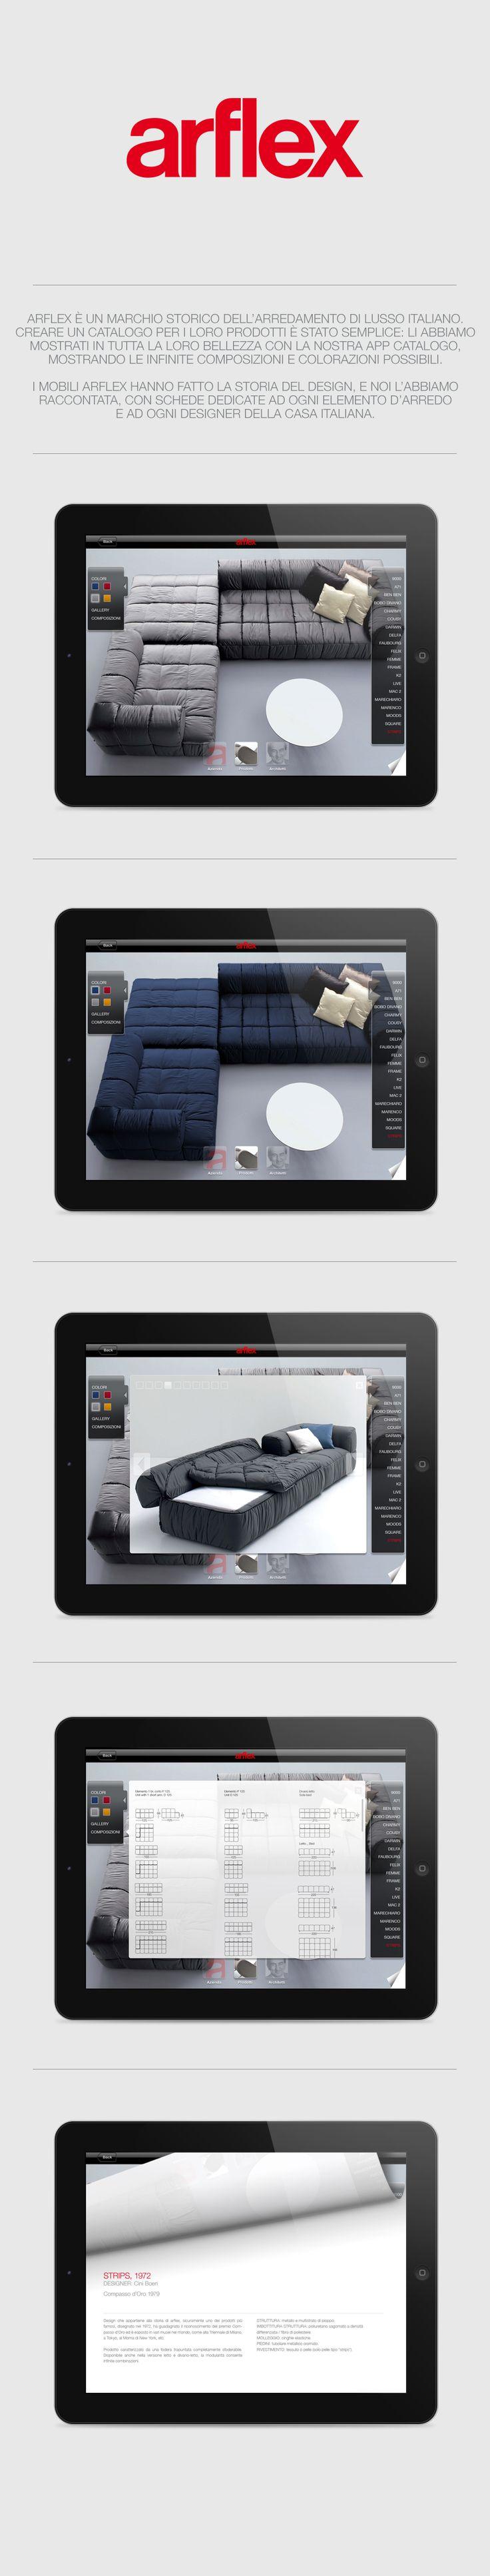 #arflex app mobile #Dandelio